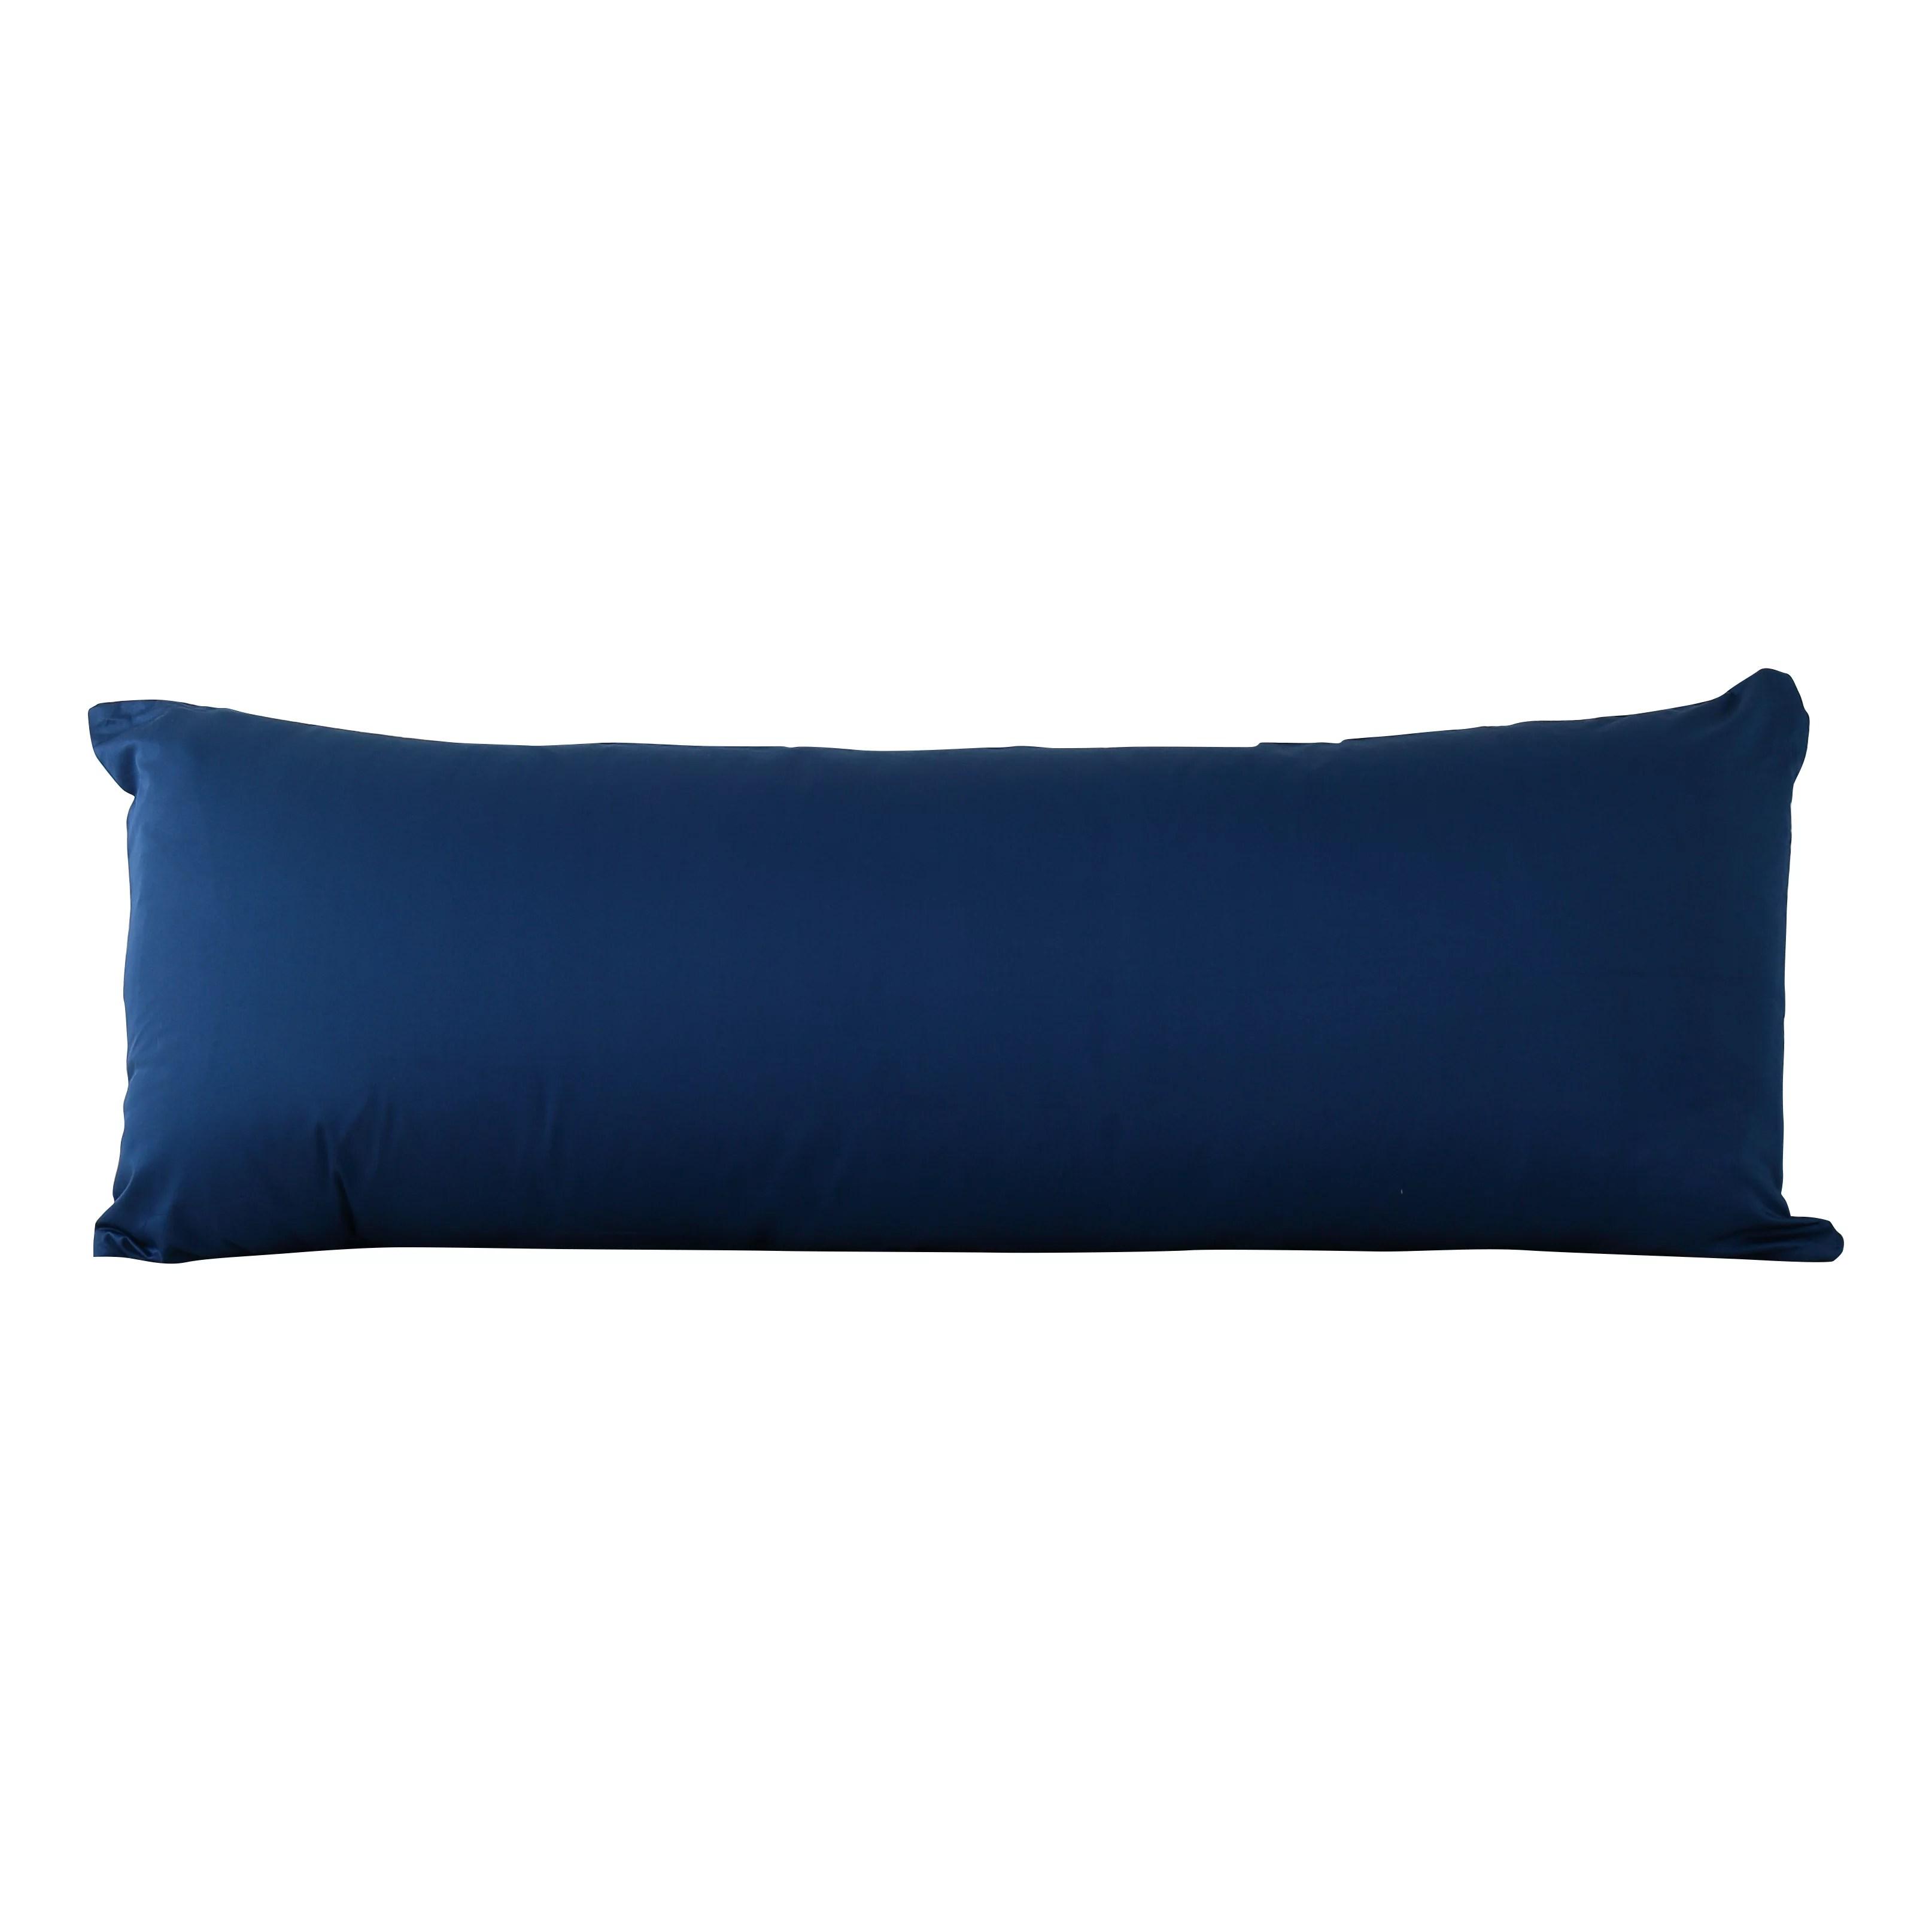 evolive 300tc 100 cotton body pillow cover with zipper closure 21 x54 walmart com